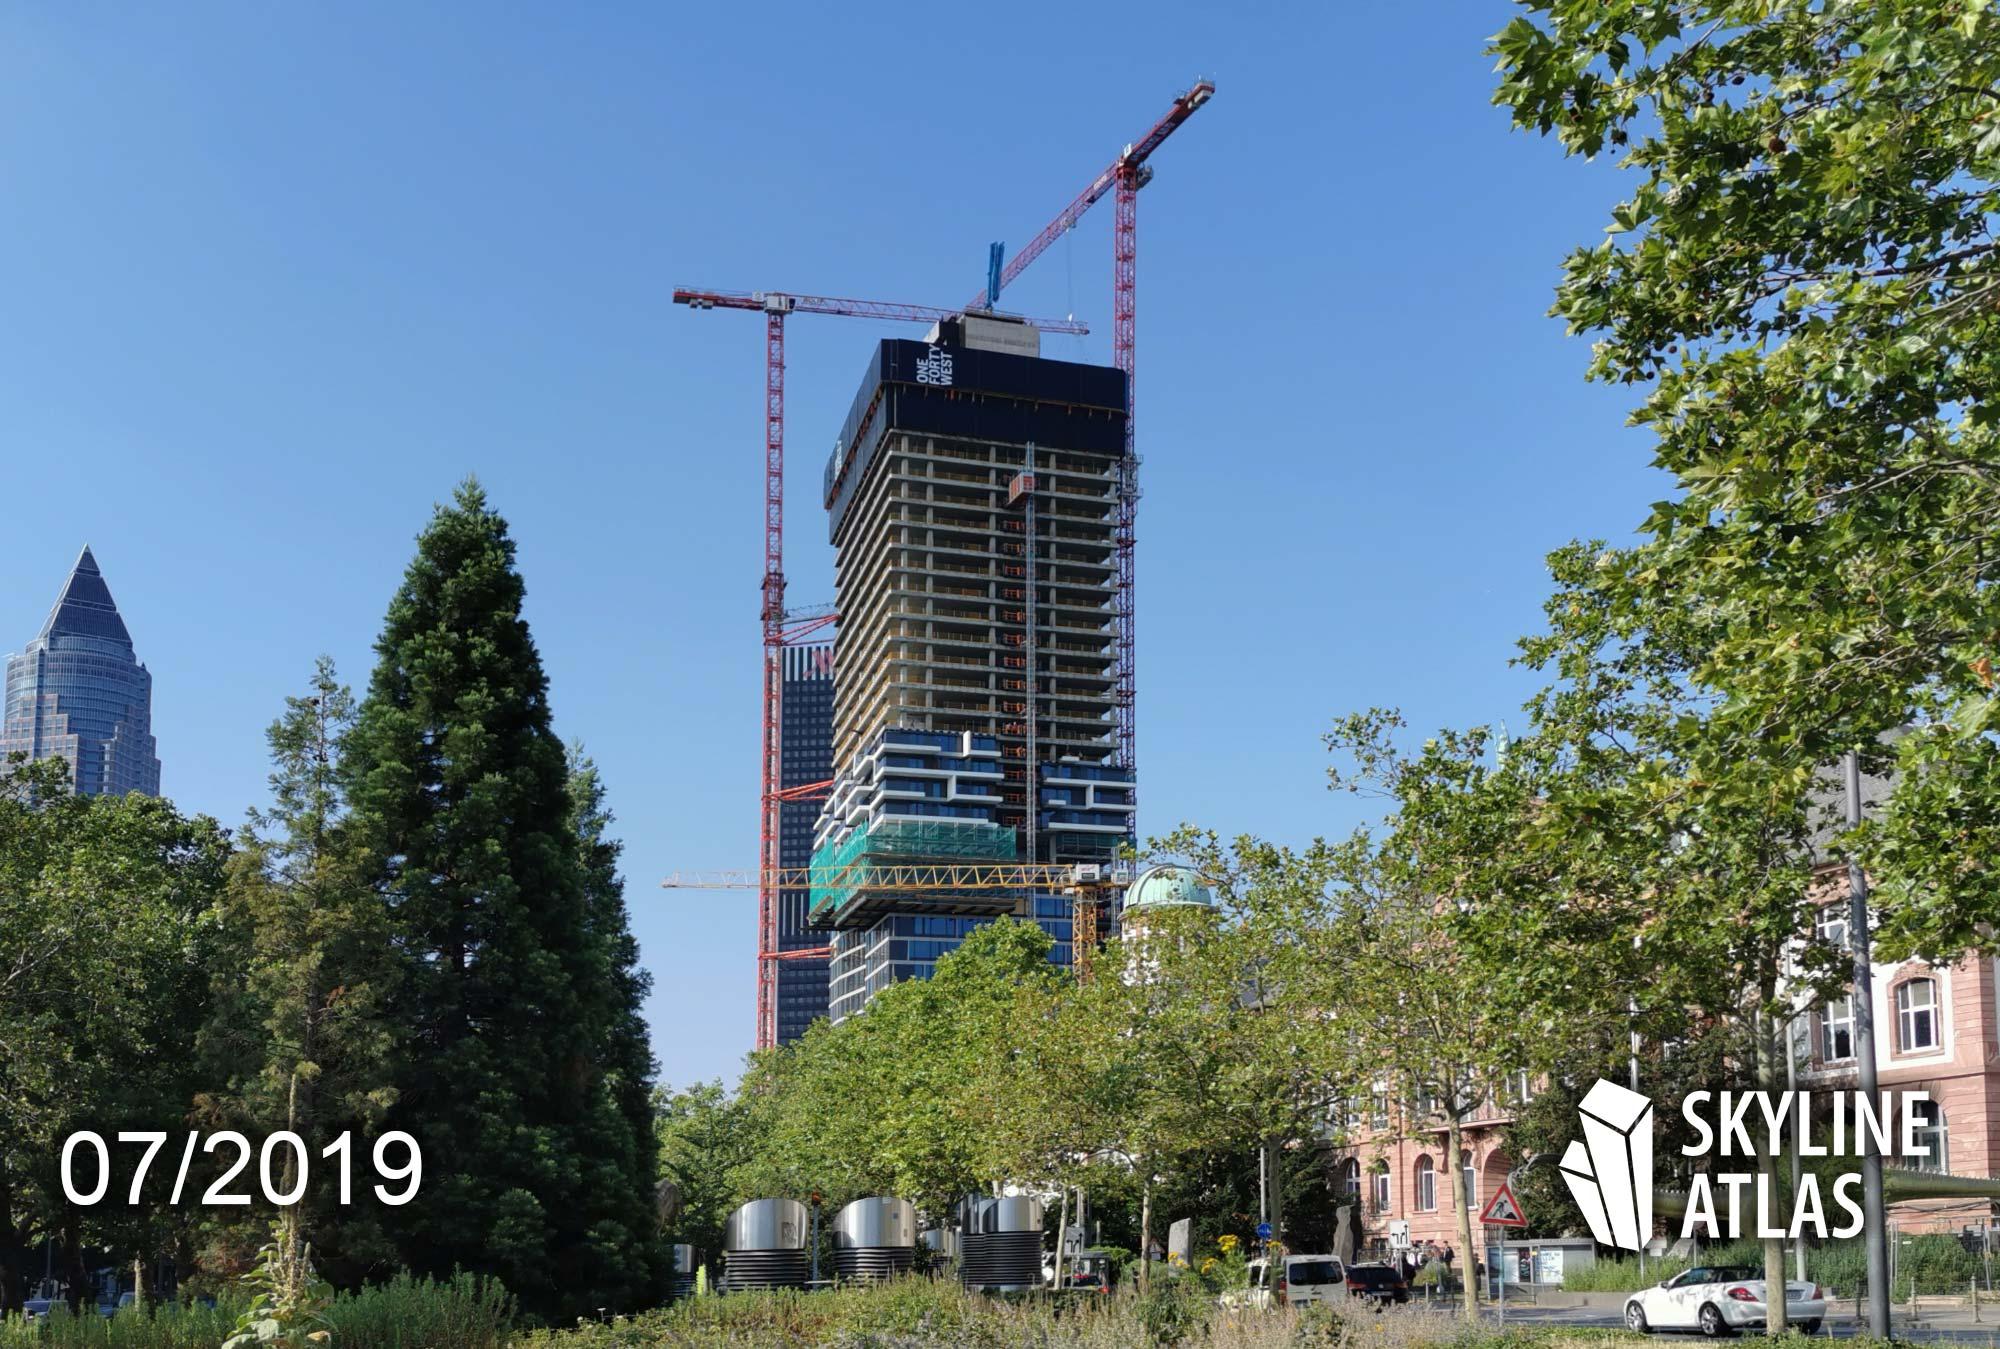 140 West in Frankfurt - ONE FORT WEST - Apartmenthochhaus in Frankfurt - Neubau Frankfurt - Neue Wohnungen und Hotel - im Bau Juli 2019